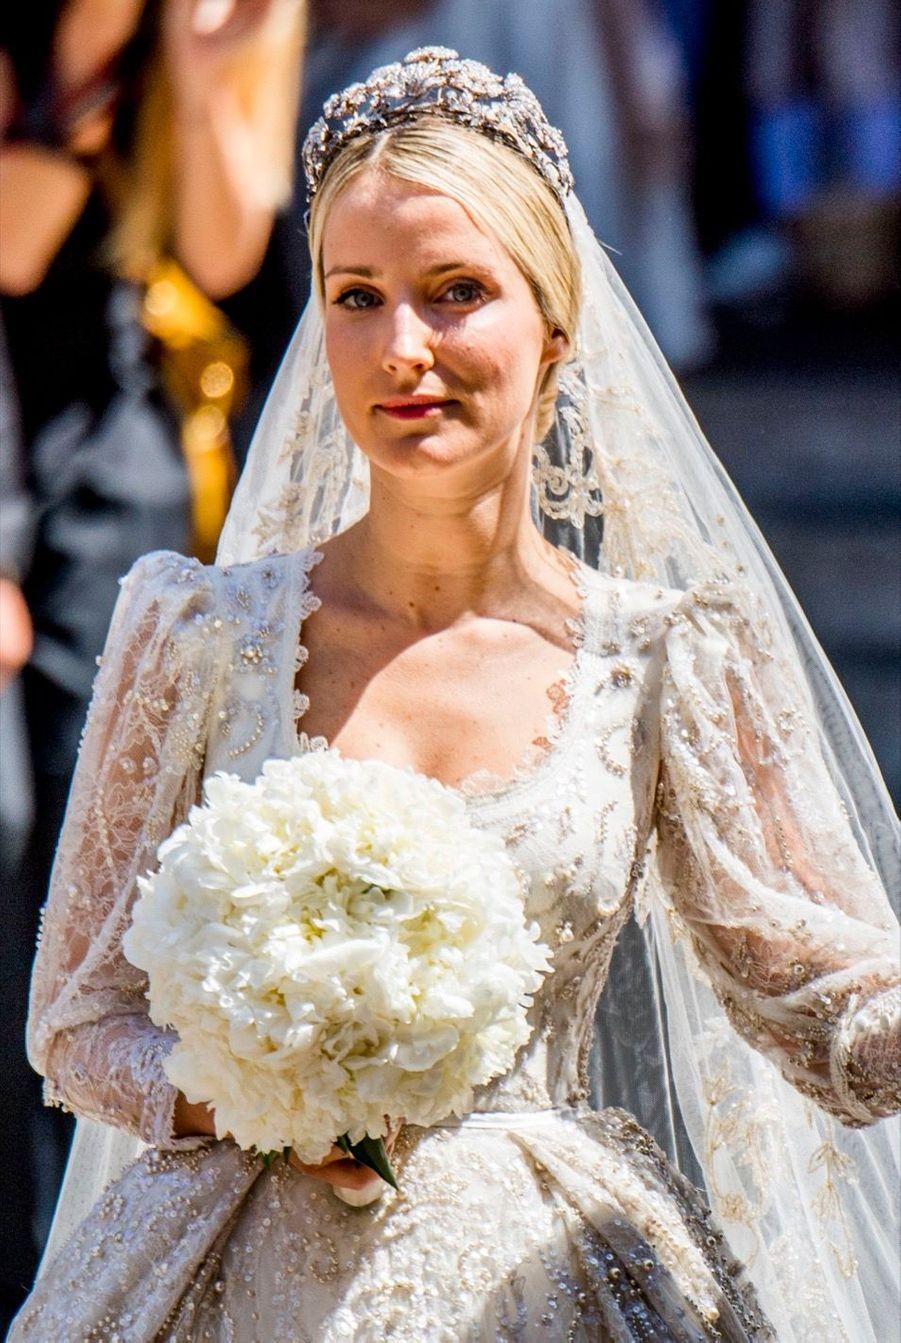 Le Mariage Du Prince Ernst August De Hanovre Et Ekaterina Malysheva, Le Samedi 8 Juillet 2017 À Hanovre 18